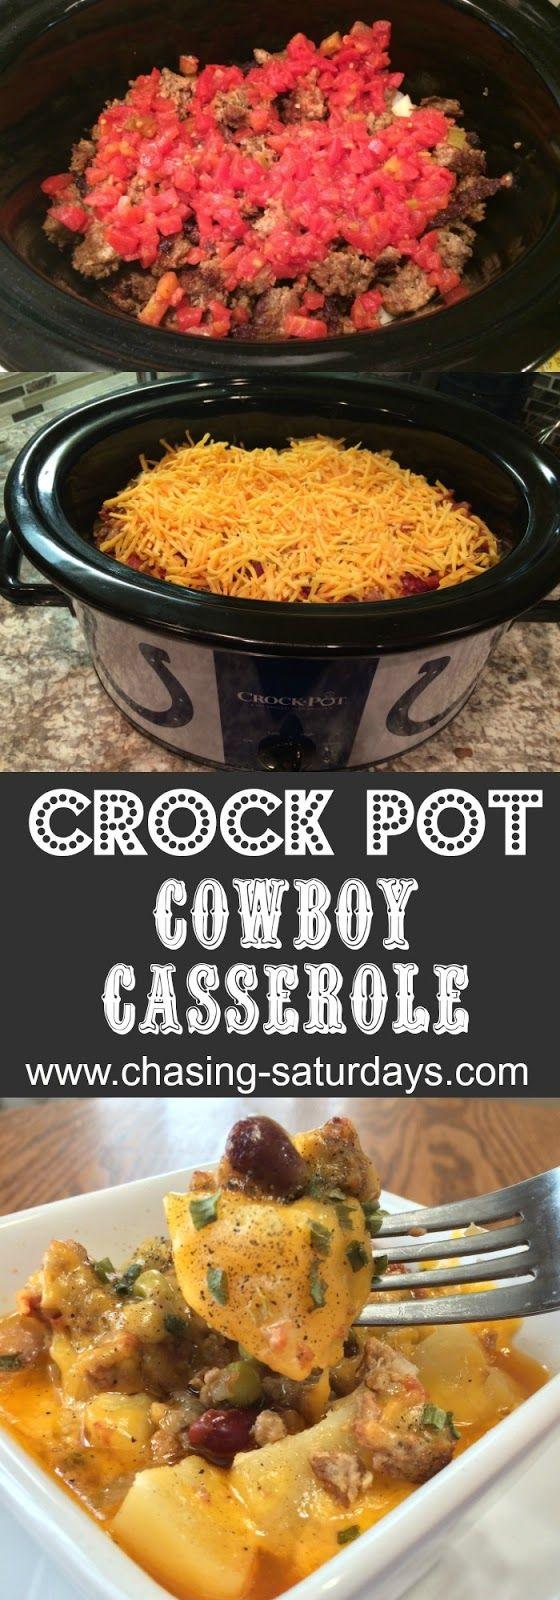 Crock Pot Cowboy Casserole #crockpotmeals